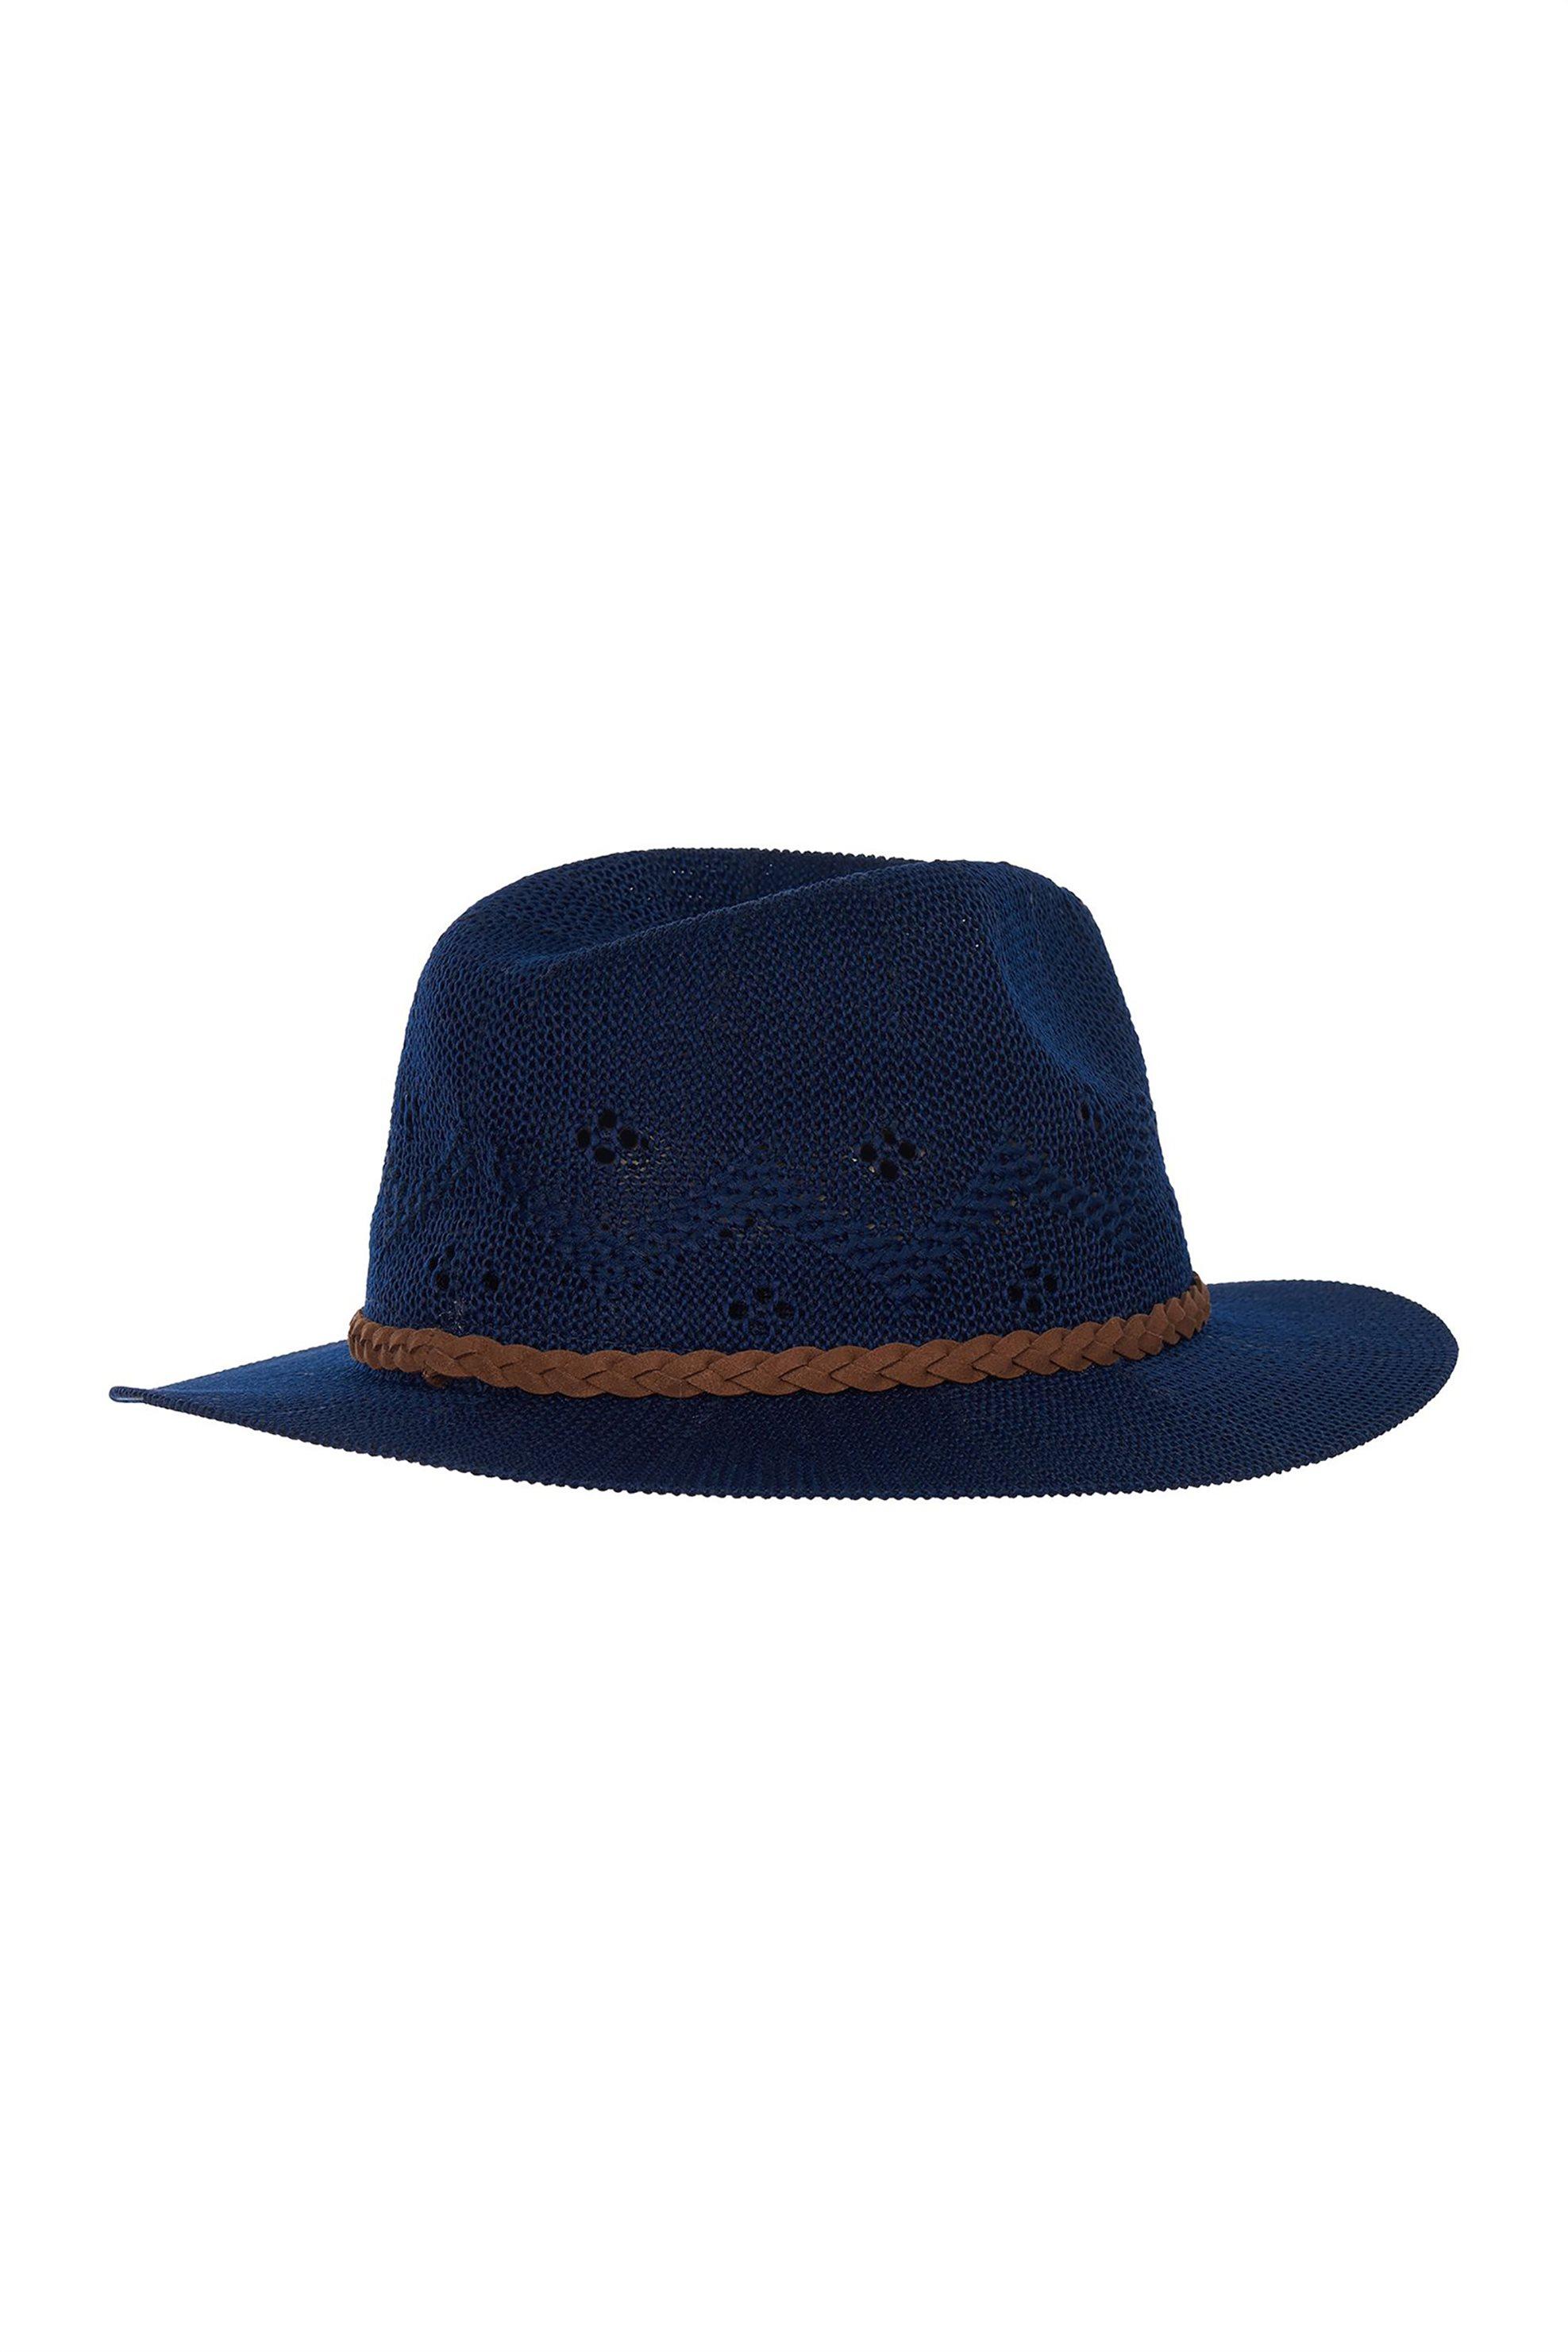 Barbour γυναικείο καπέλο με διακοσμητικό κέντημα